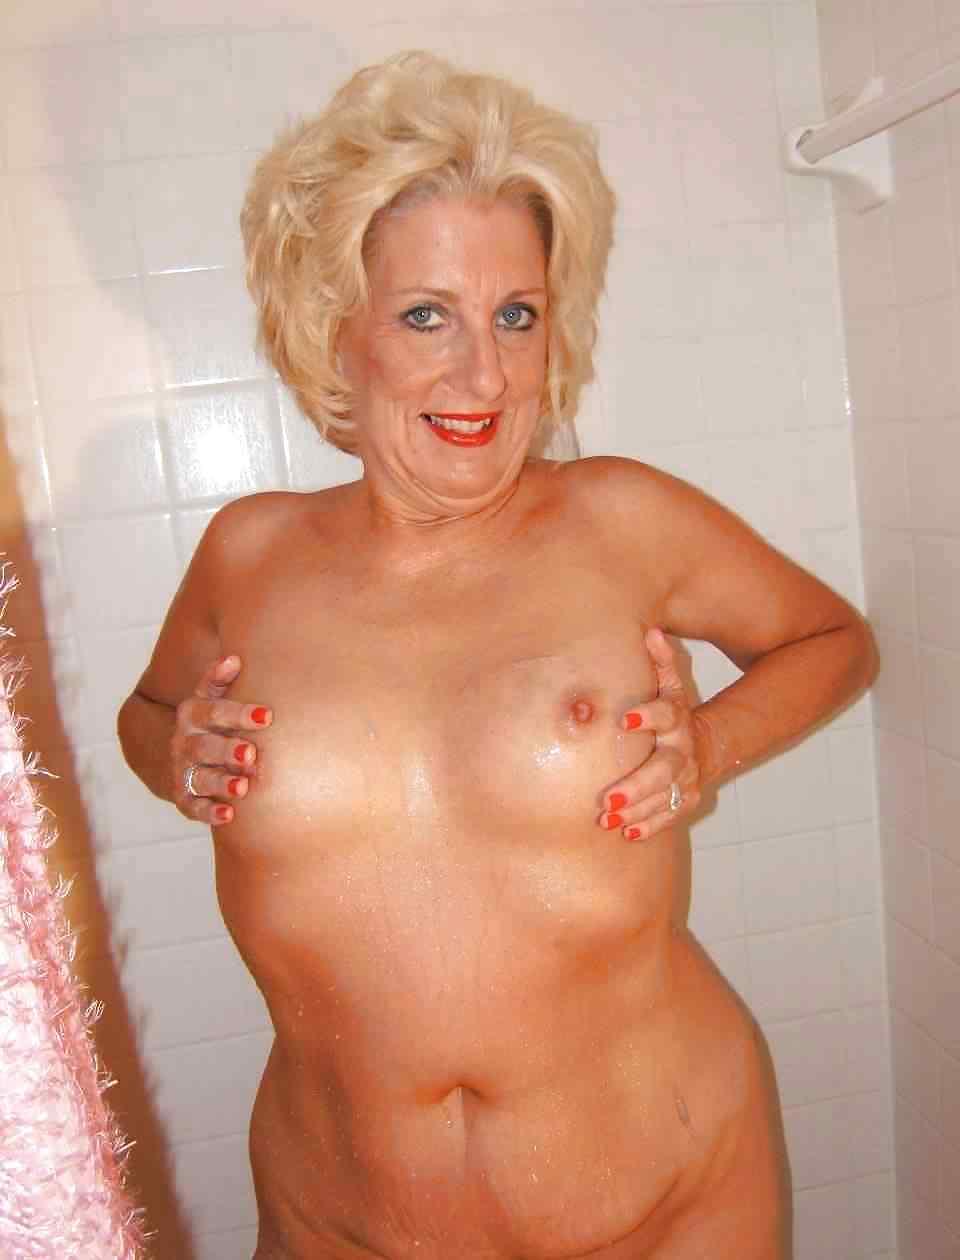 Grandma sexy shower pic — 4